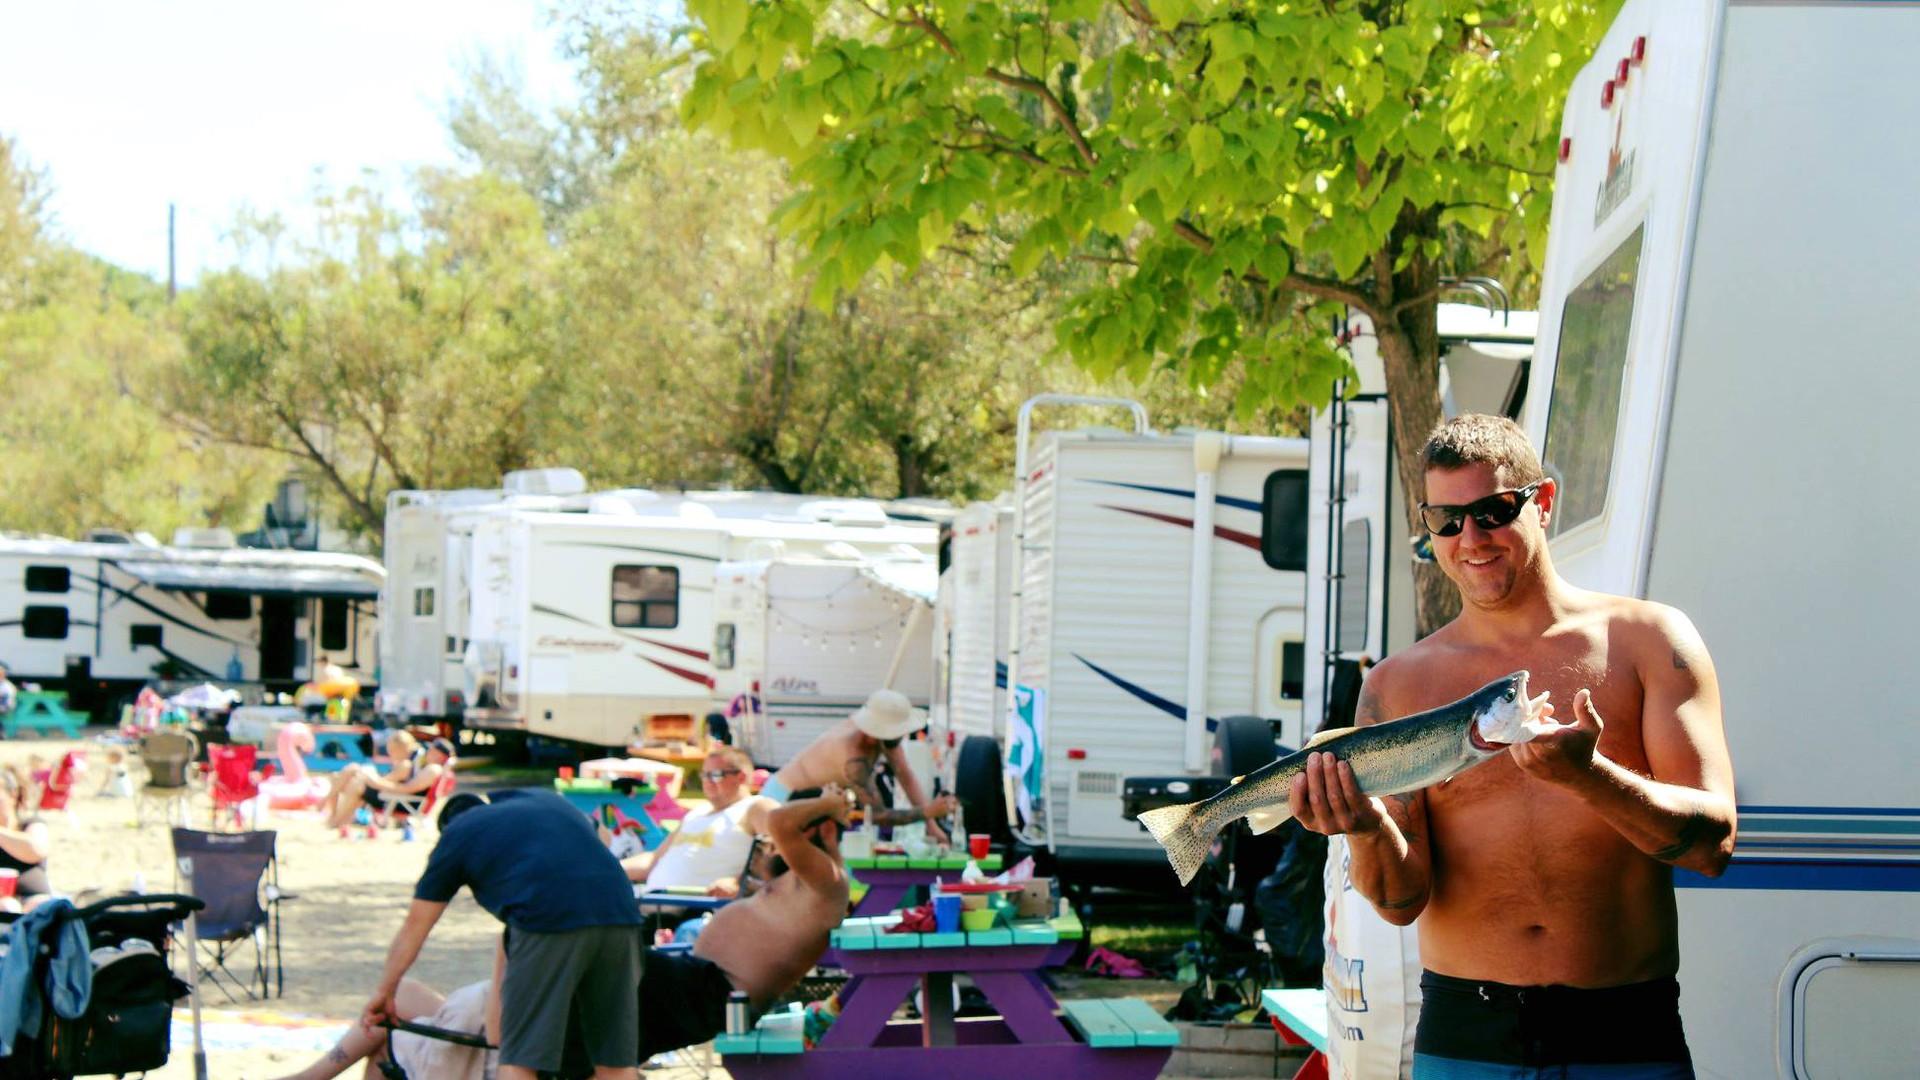 rv_campsites_campers_fish_Wood-Lake-RV-p